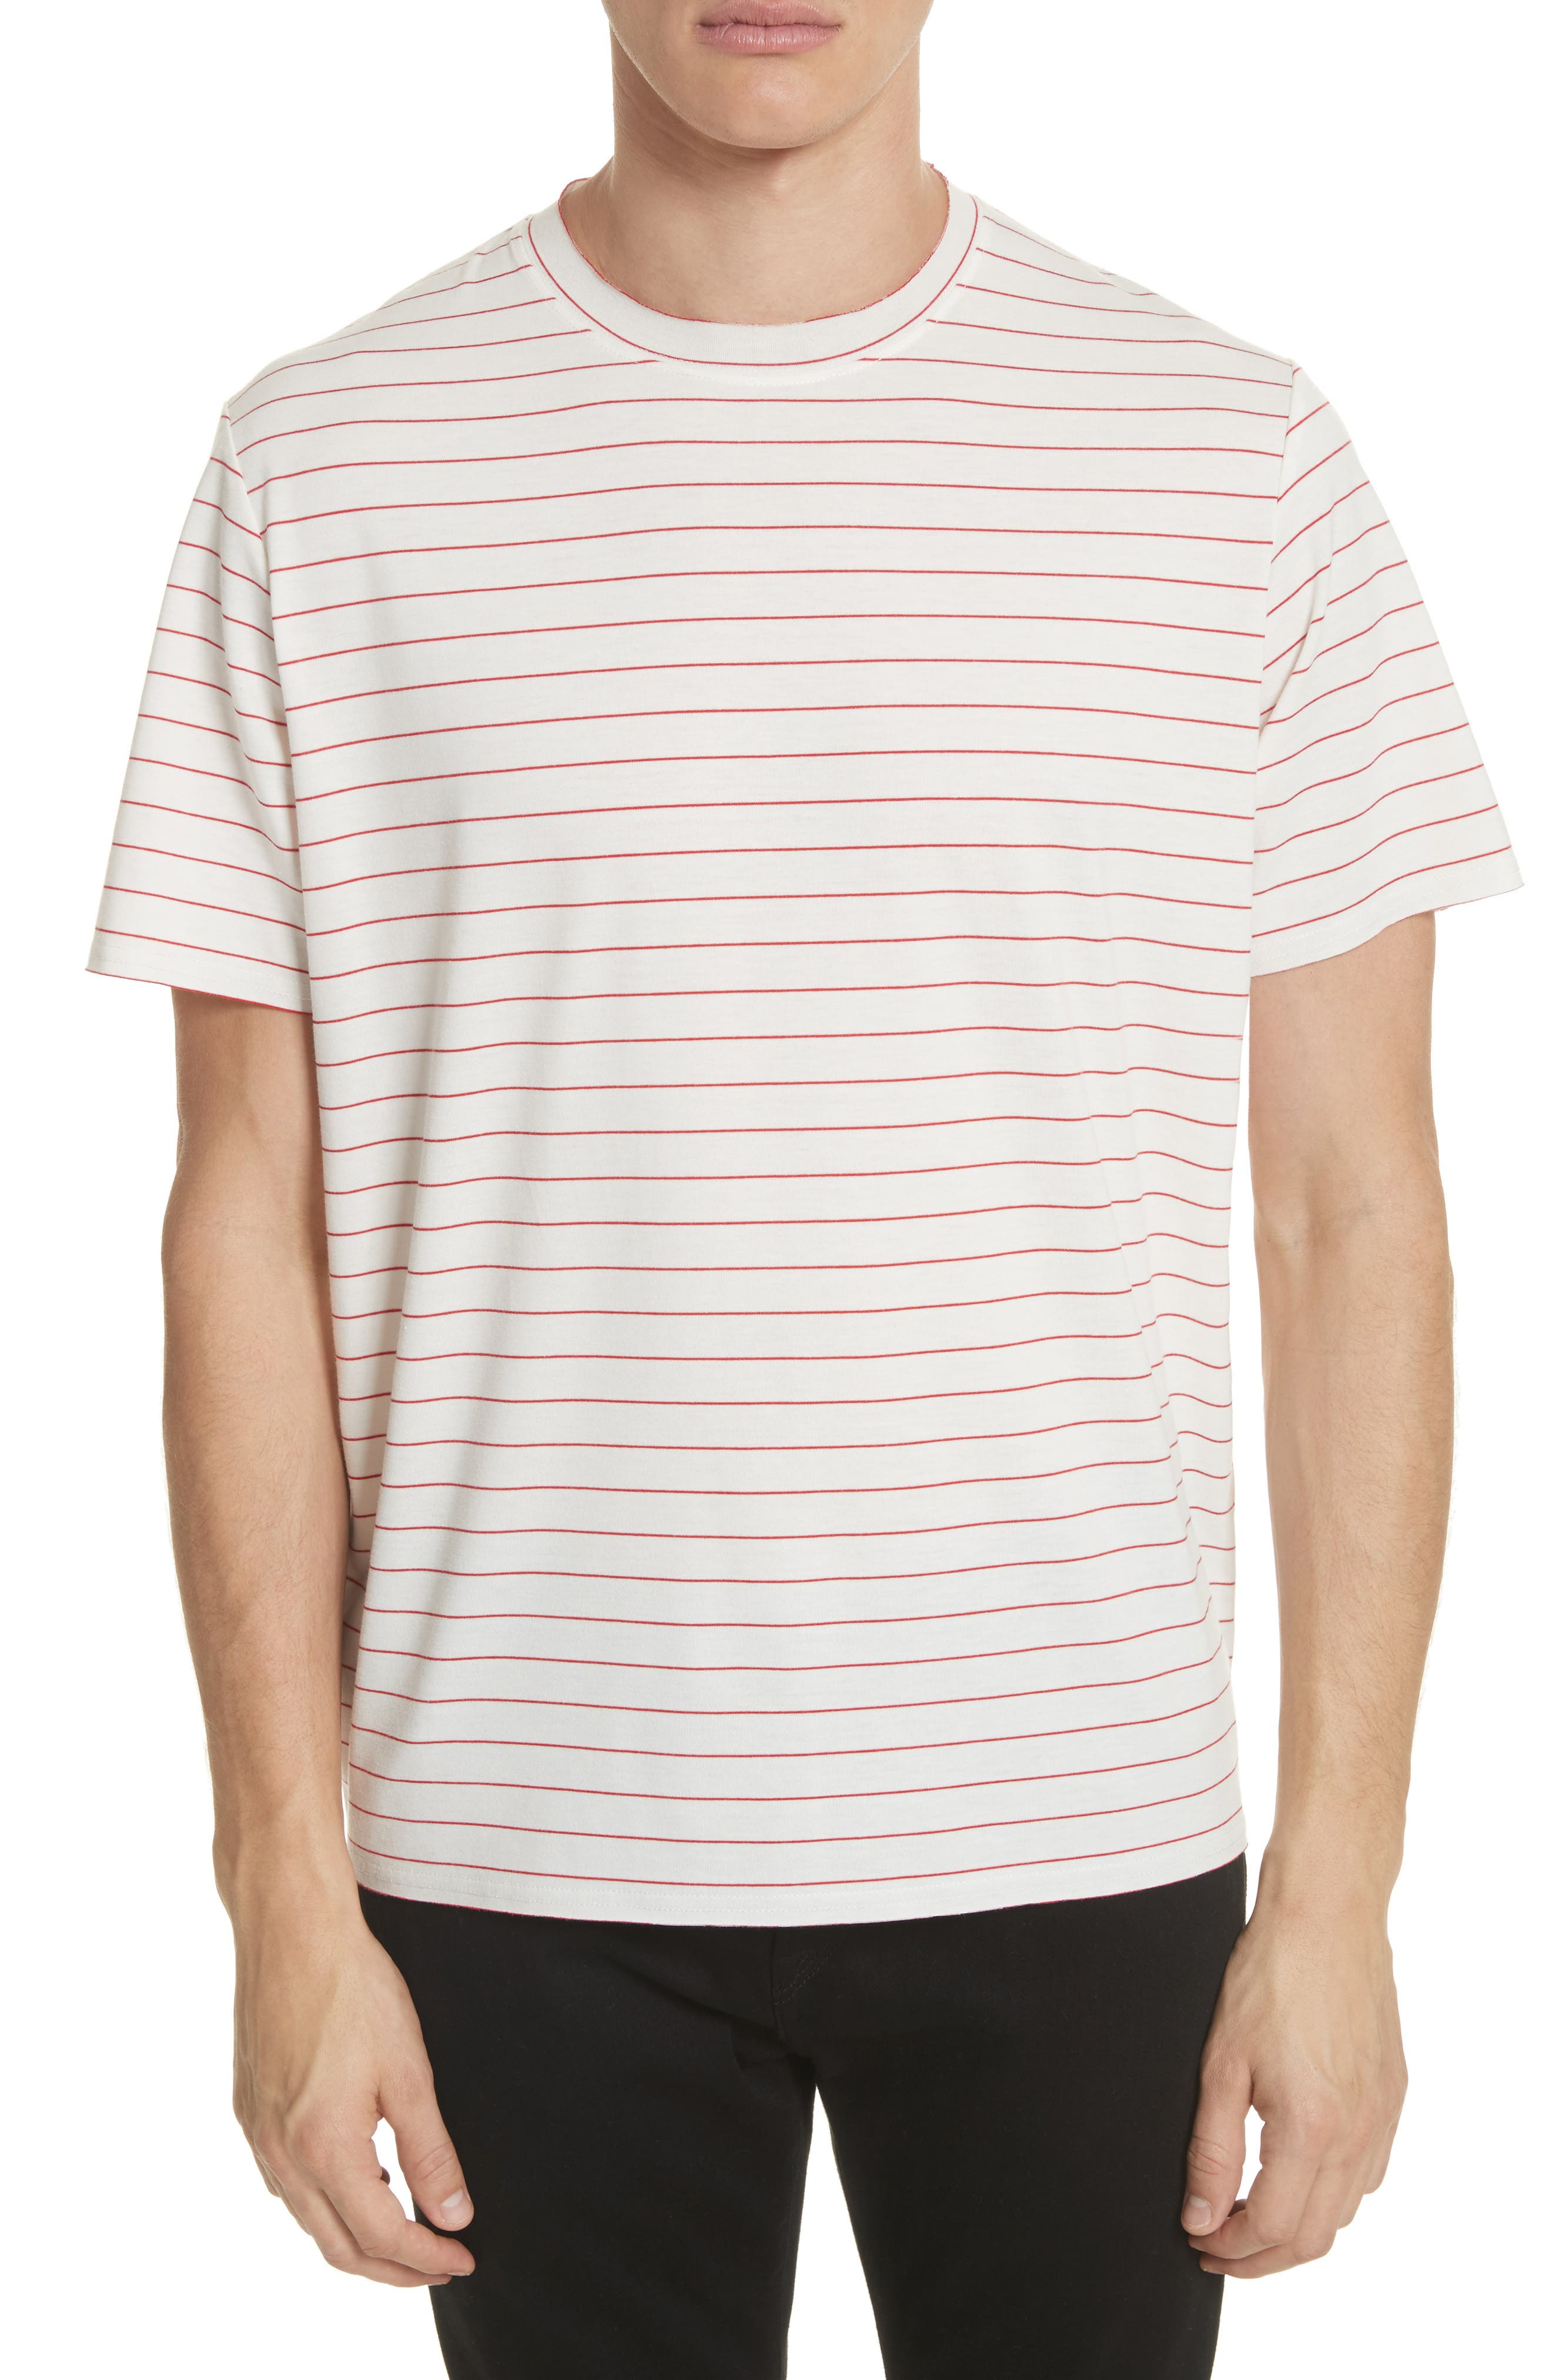 Stripe Crewneck T-Shirt,                         Main,                         color, White/ Red